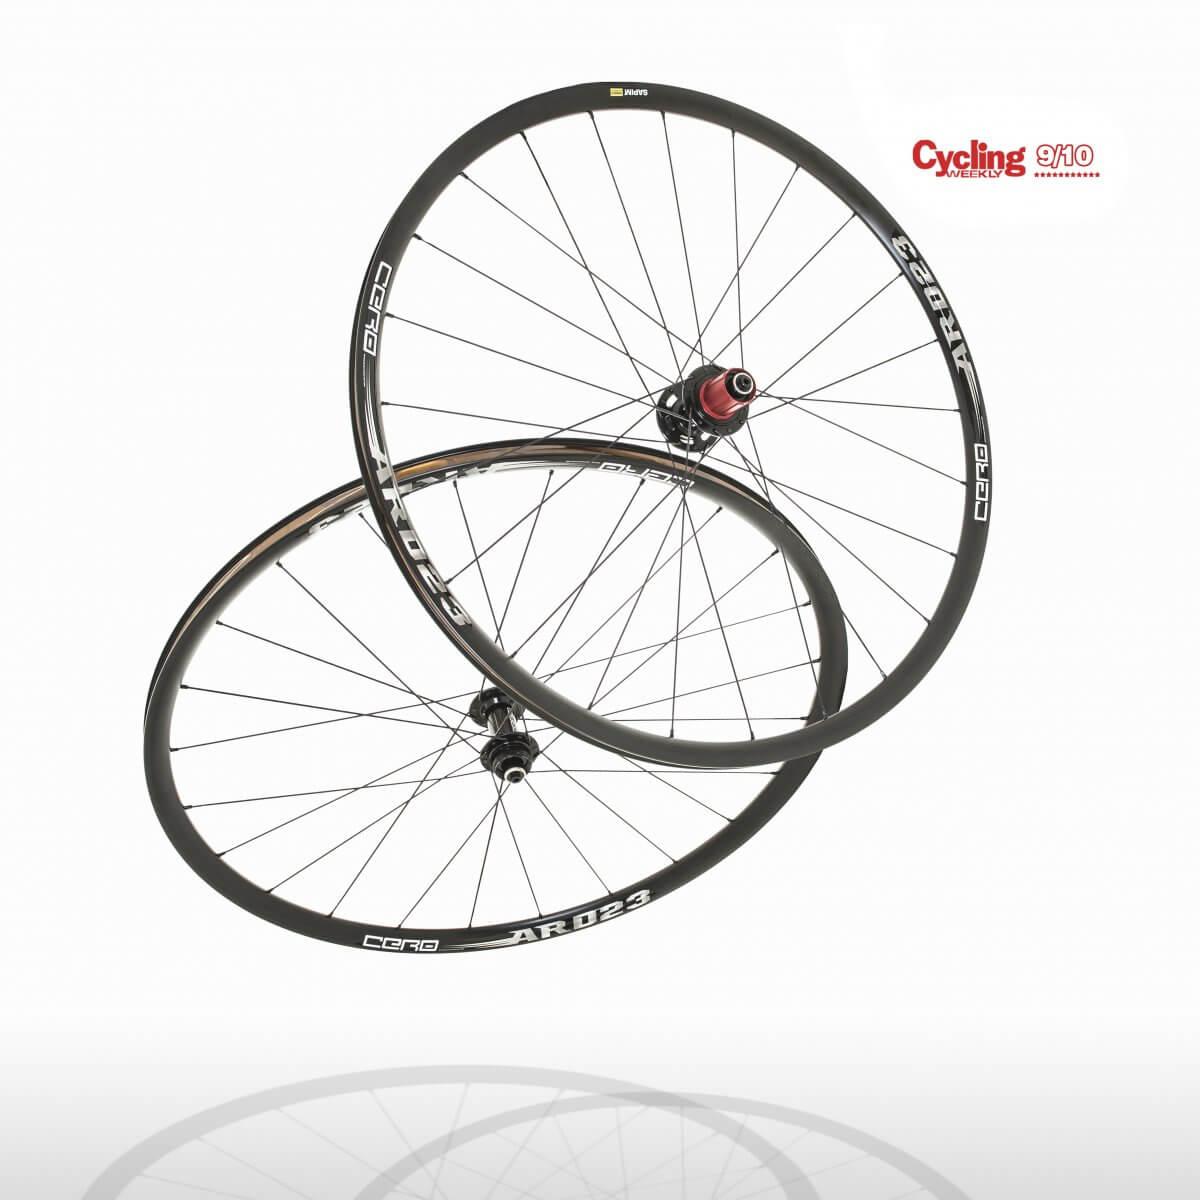 Cero ARD23 Aluminium Disc Clincher Wheelset WAS £399.99